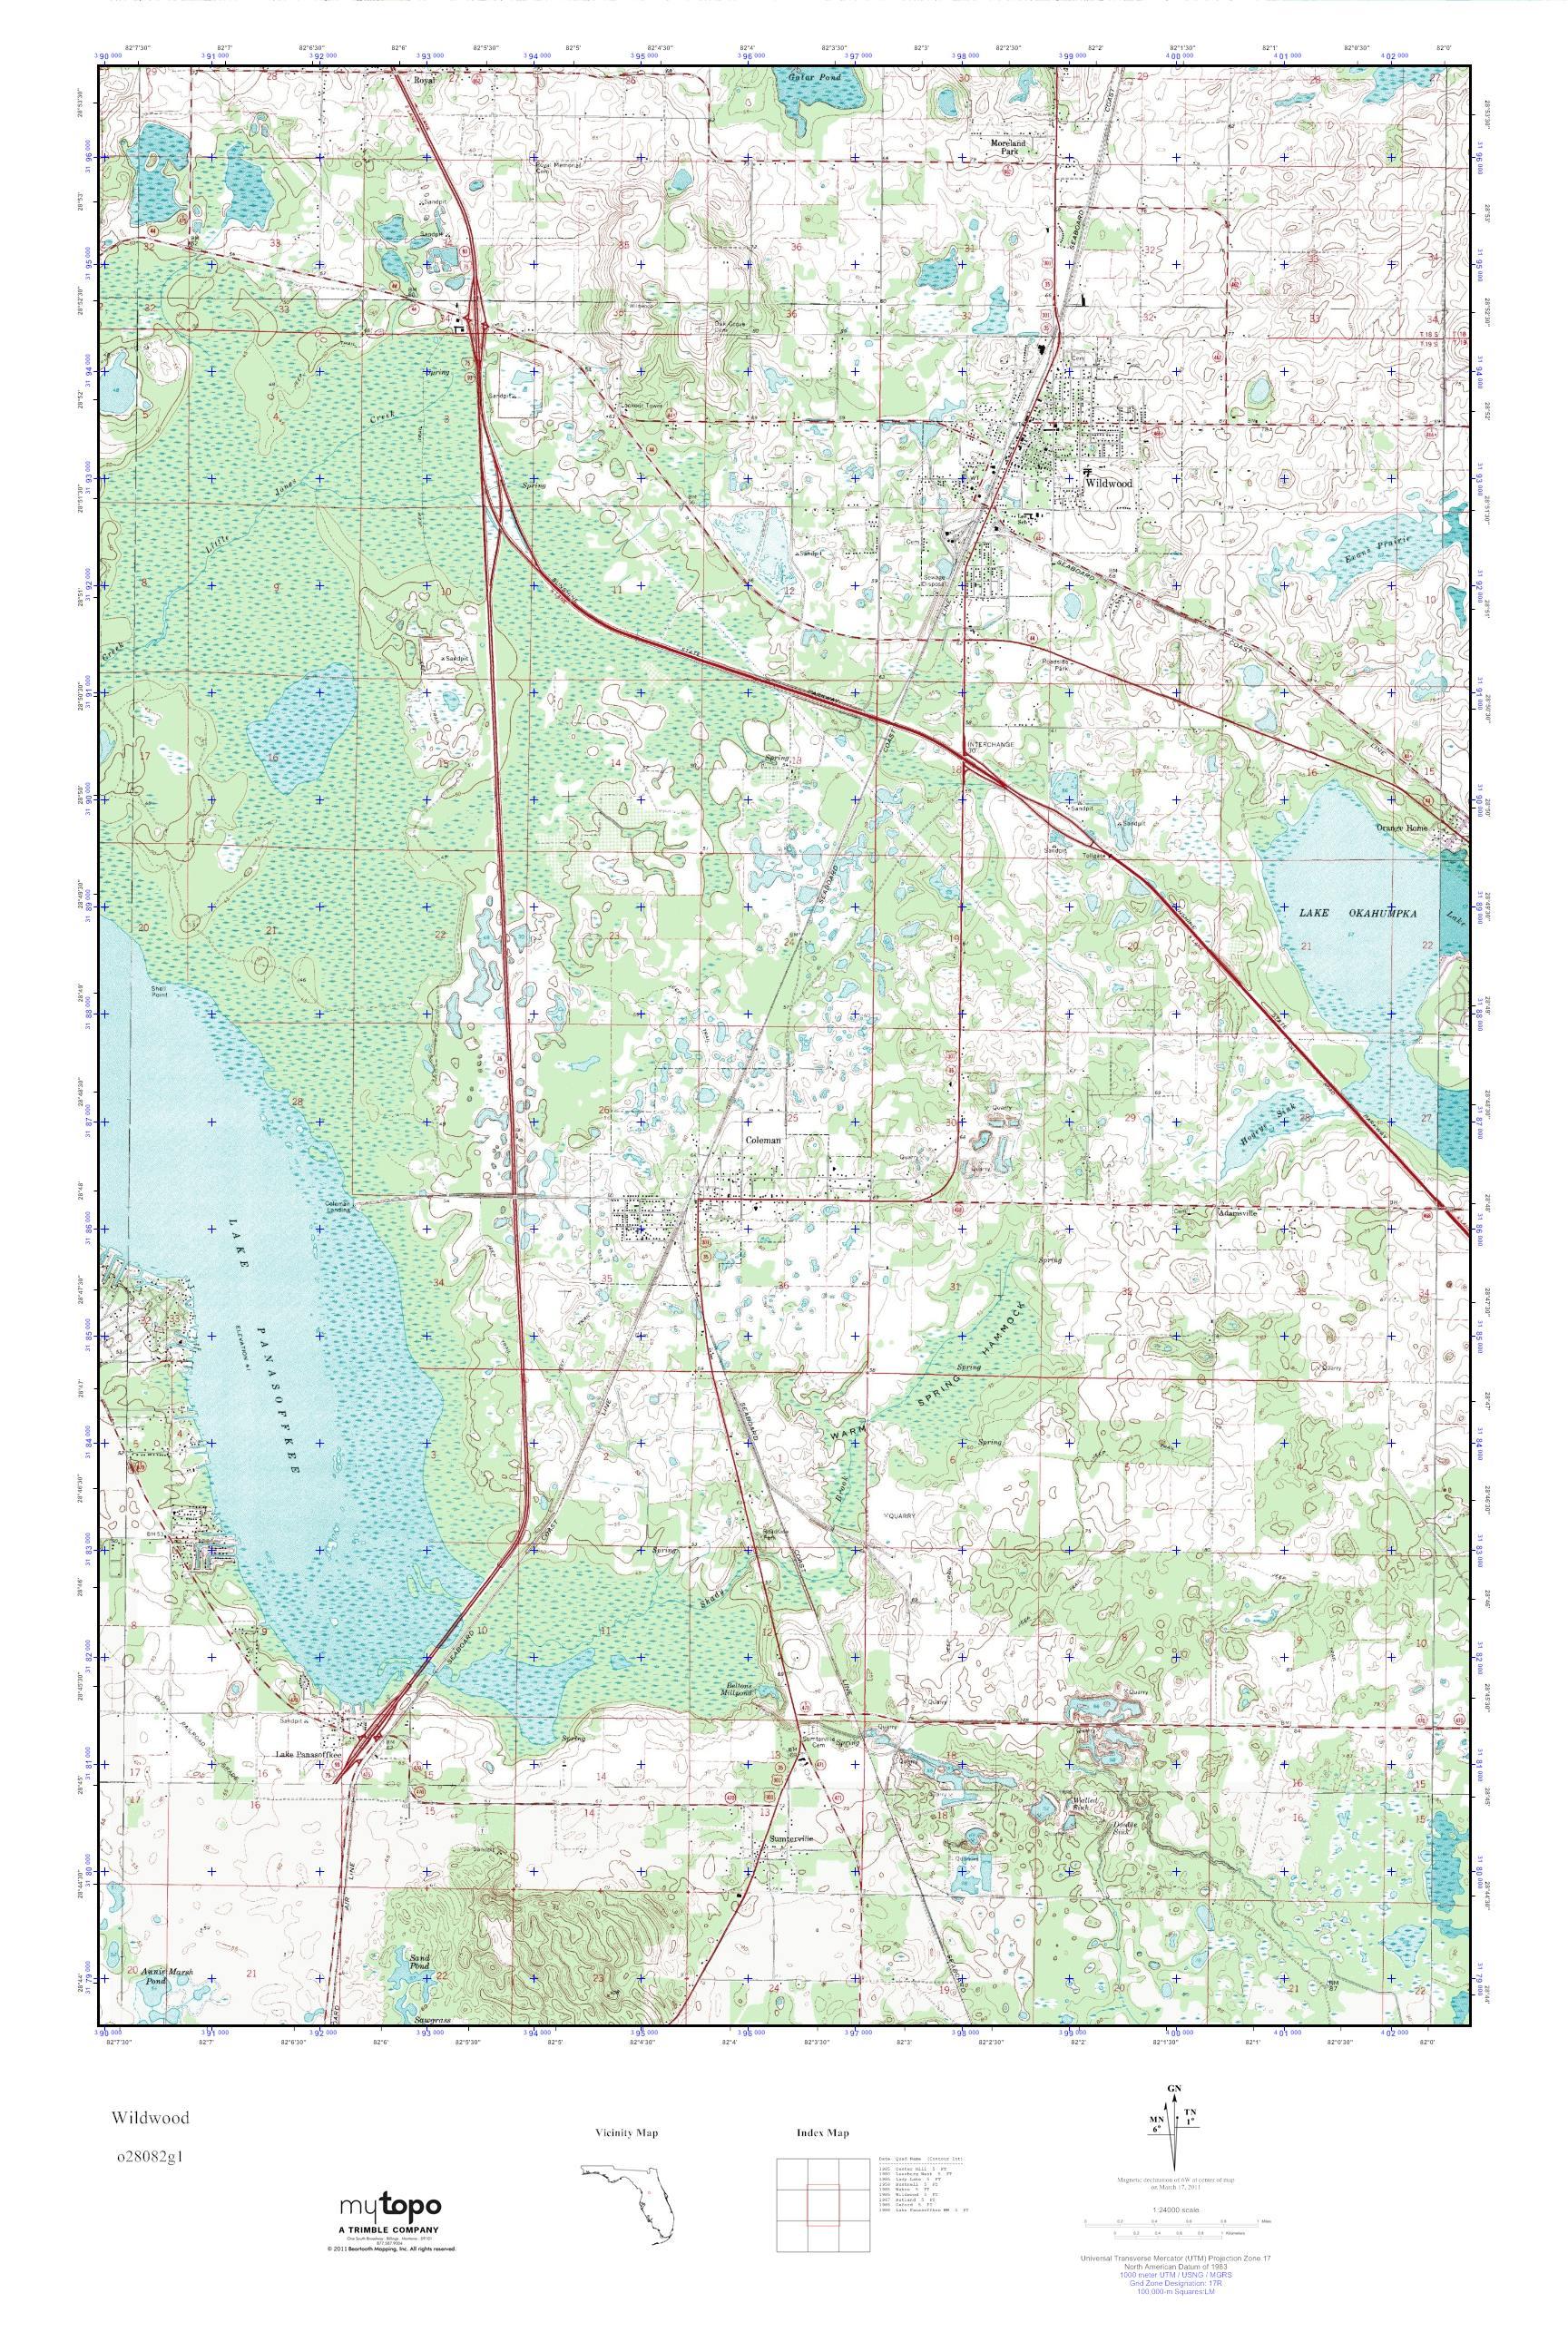 Wildwood Florida Map.Mytopo Wildwood Florida Usgs Quad Topo Map